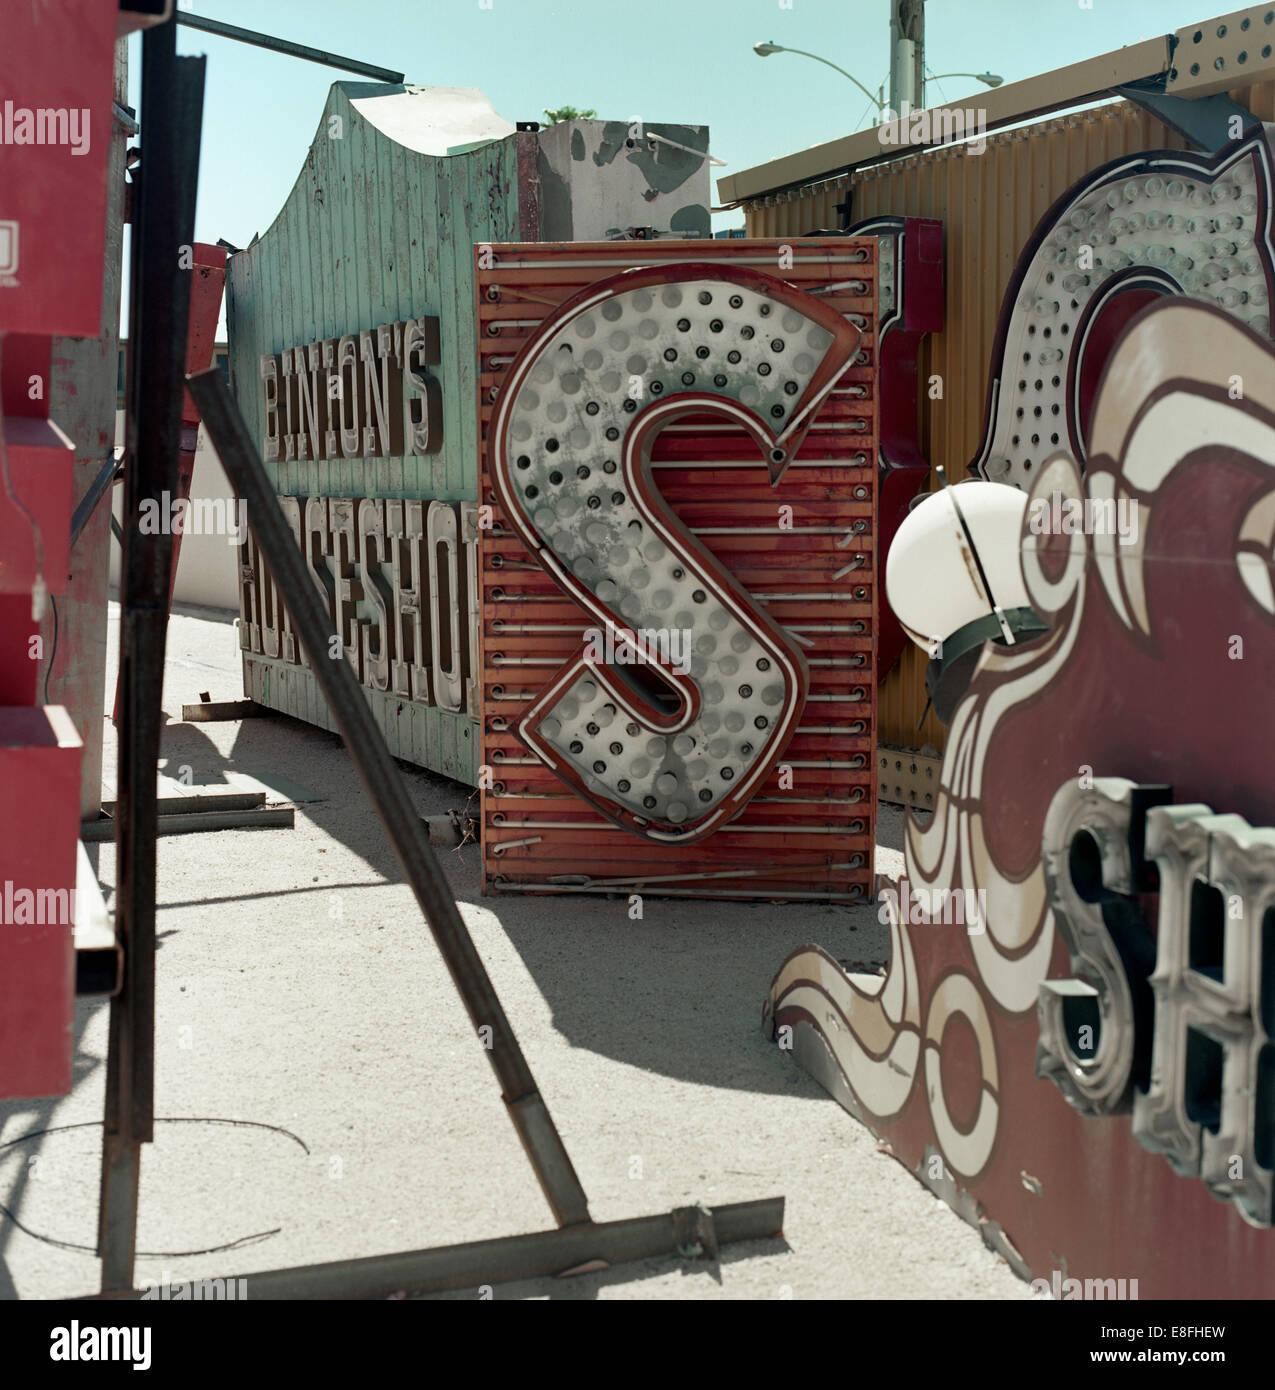 USA, Nevada, Clark County, Las Vegas, Back yard - Stock Image